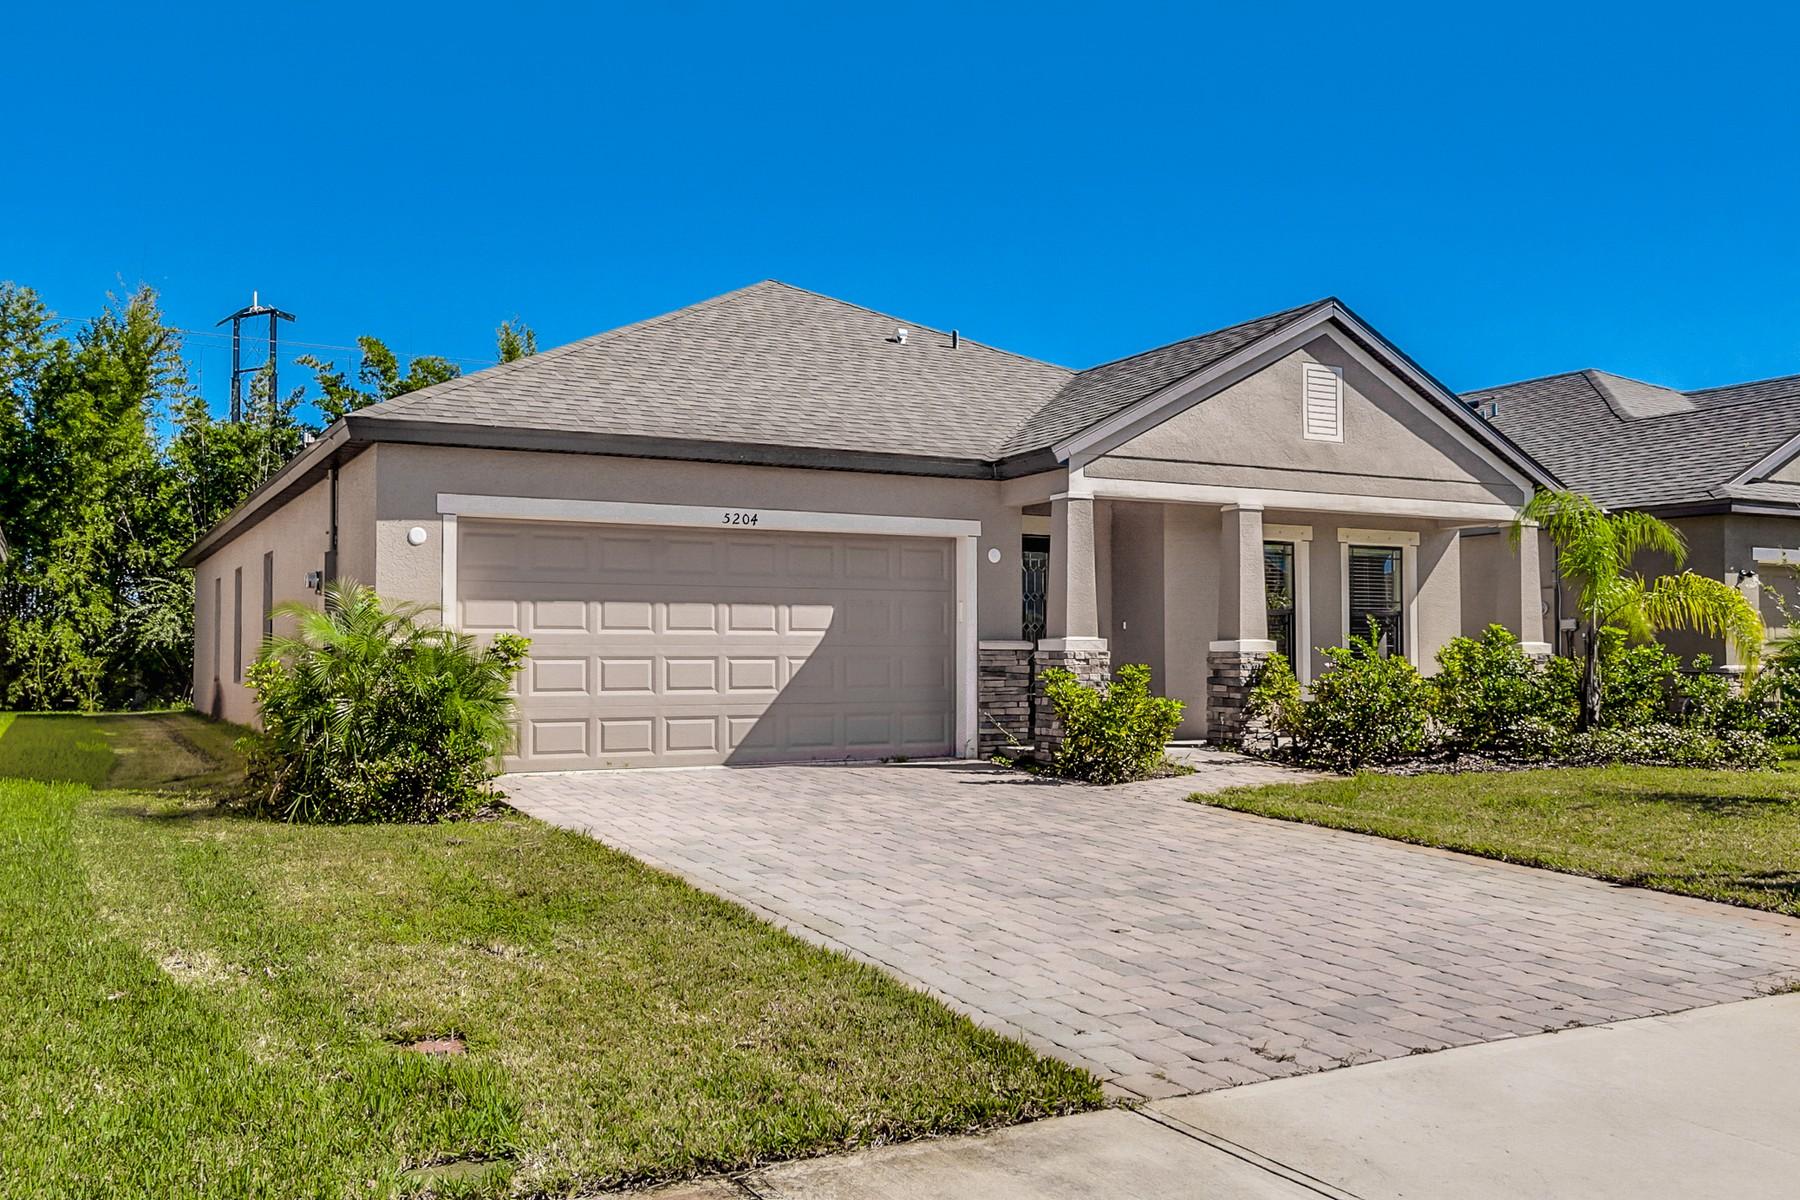 Casa Unifamiliar por un Venta en 5204 Brilliance Circle 5204 Brilliance Circle Cocoa, Florida 32926 Estados Unidos